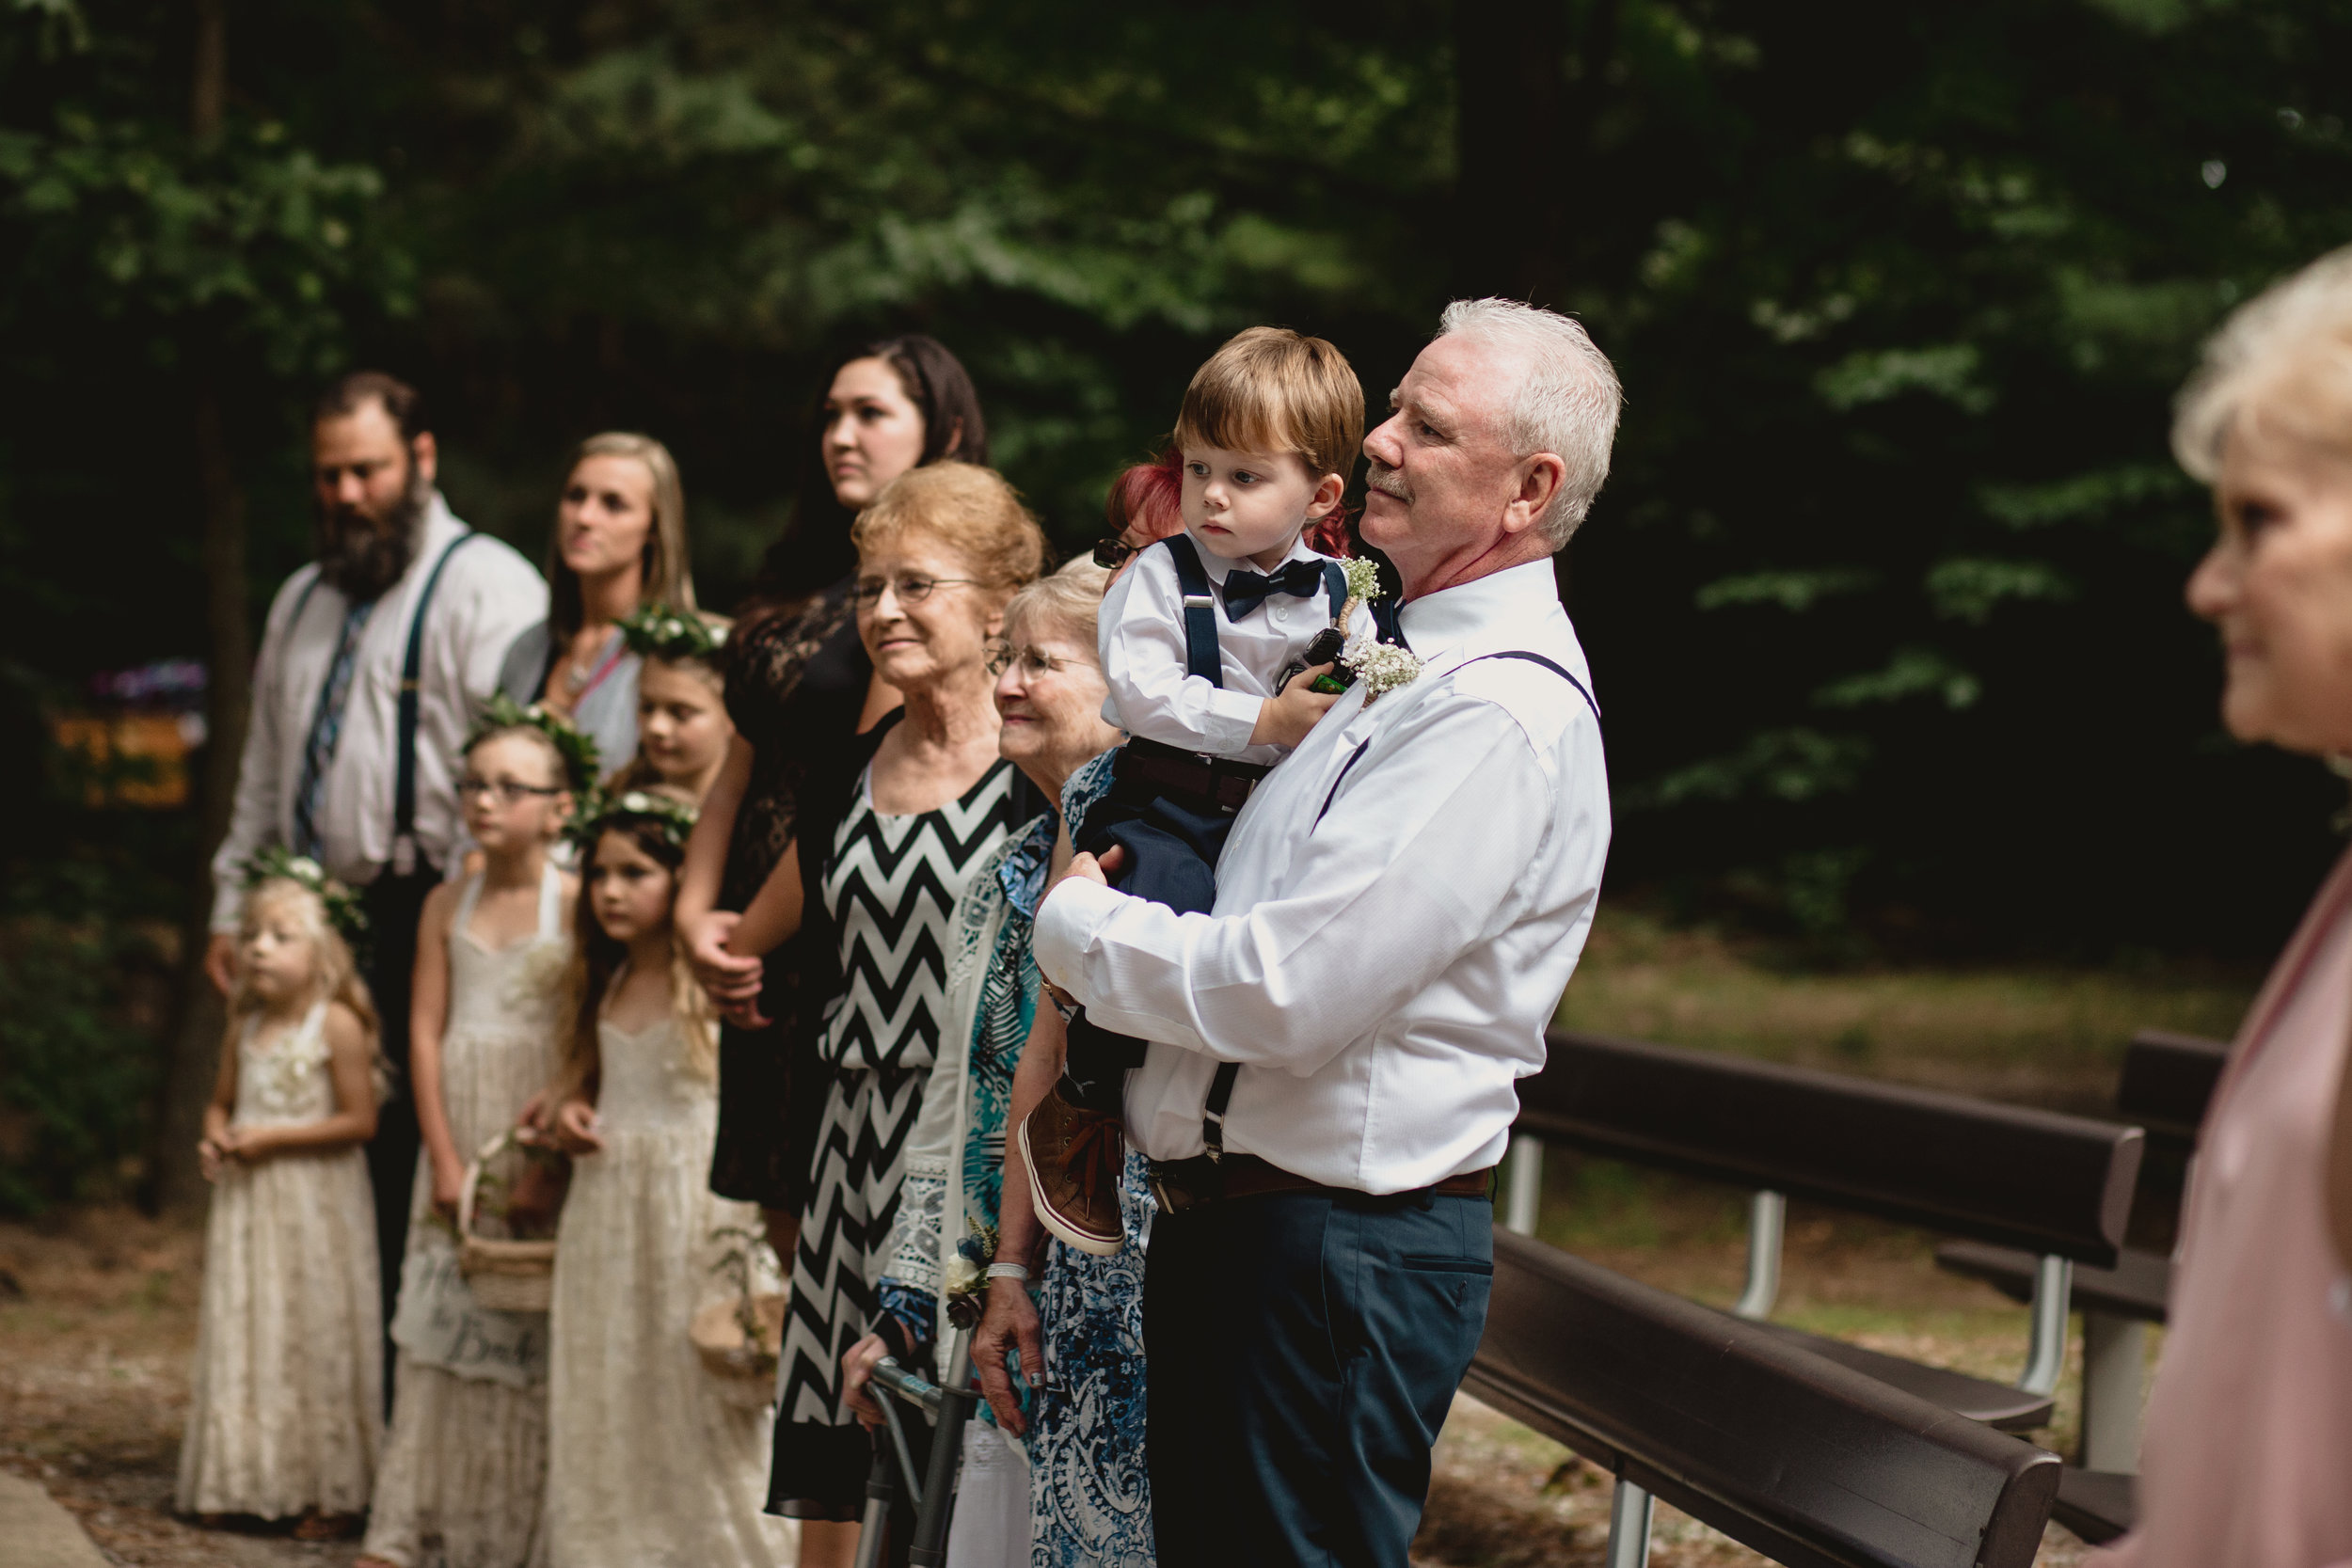 west-michigan-wedding-photographer-whitehall-rachel-austin-chapel-in-the-pines-267.jpg